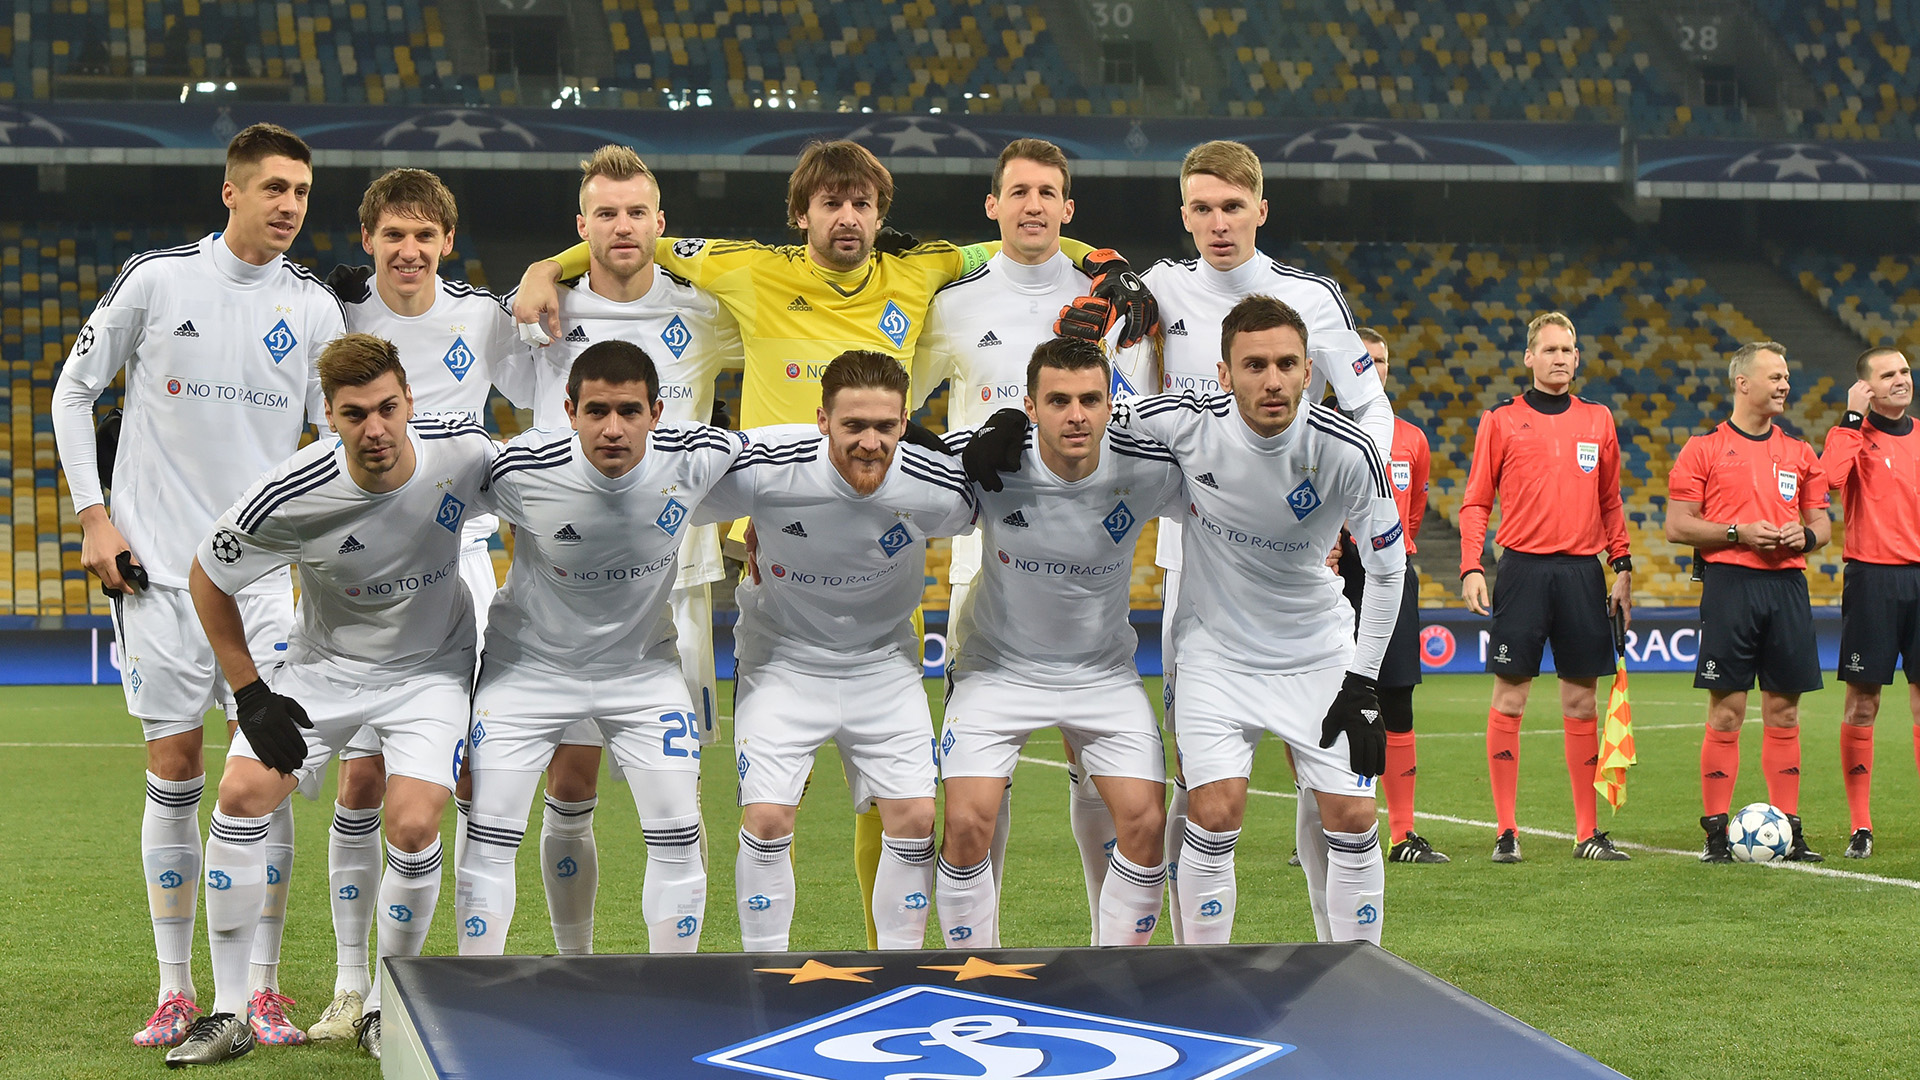 Dynamo Kyjev – Chelsea Facebook: Dynamo Kyiv